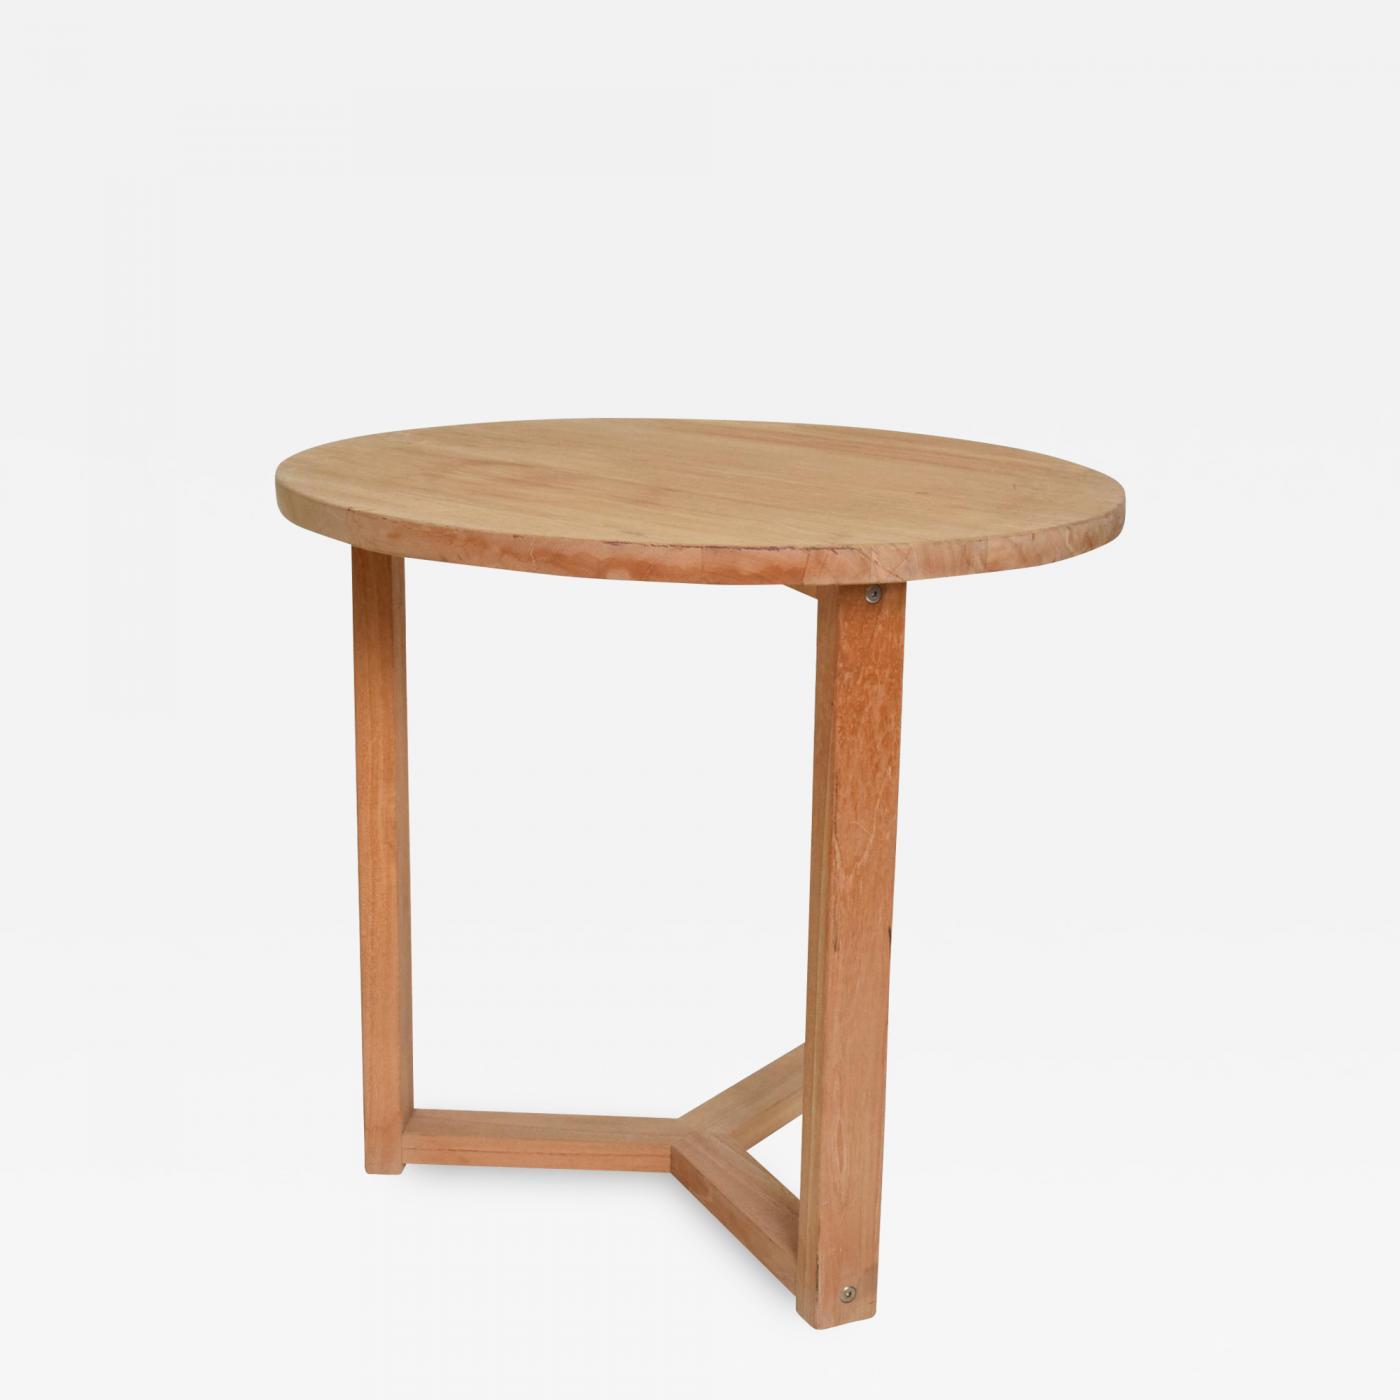 Side Table Teak.Mcguire Furniture Mid Century Modern Teak Round Side Table After Mcguire San Francisco